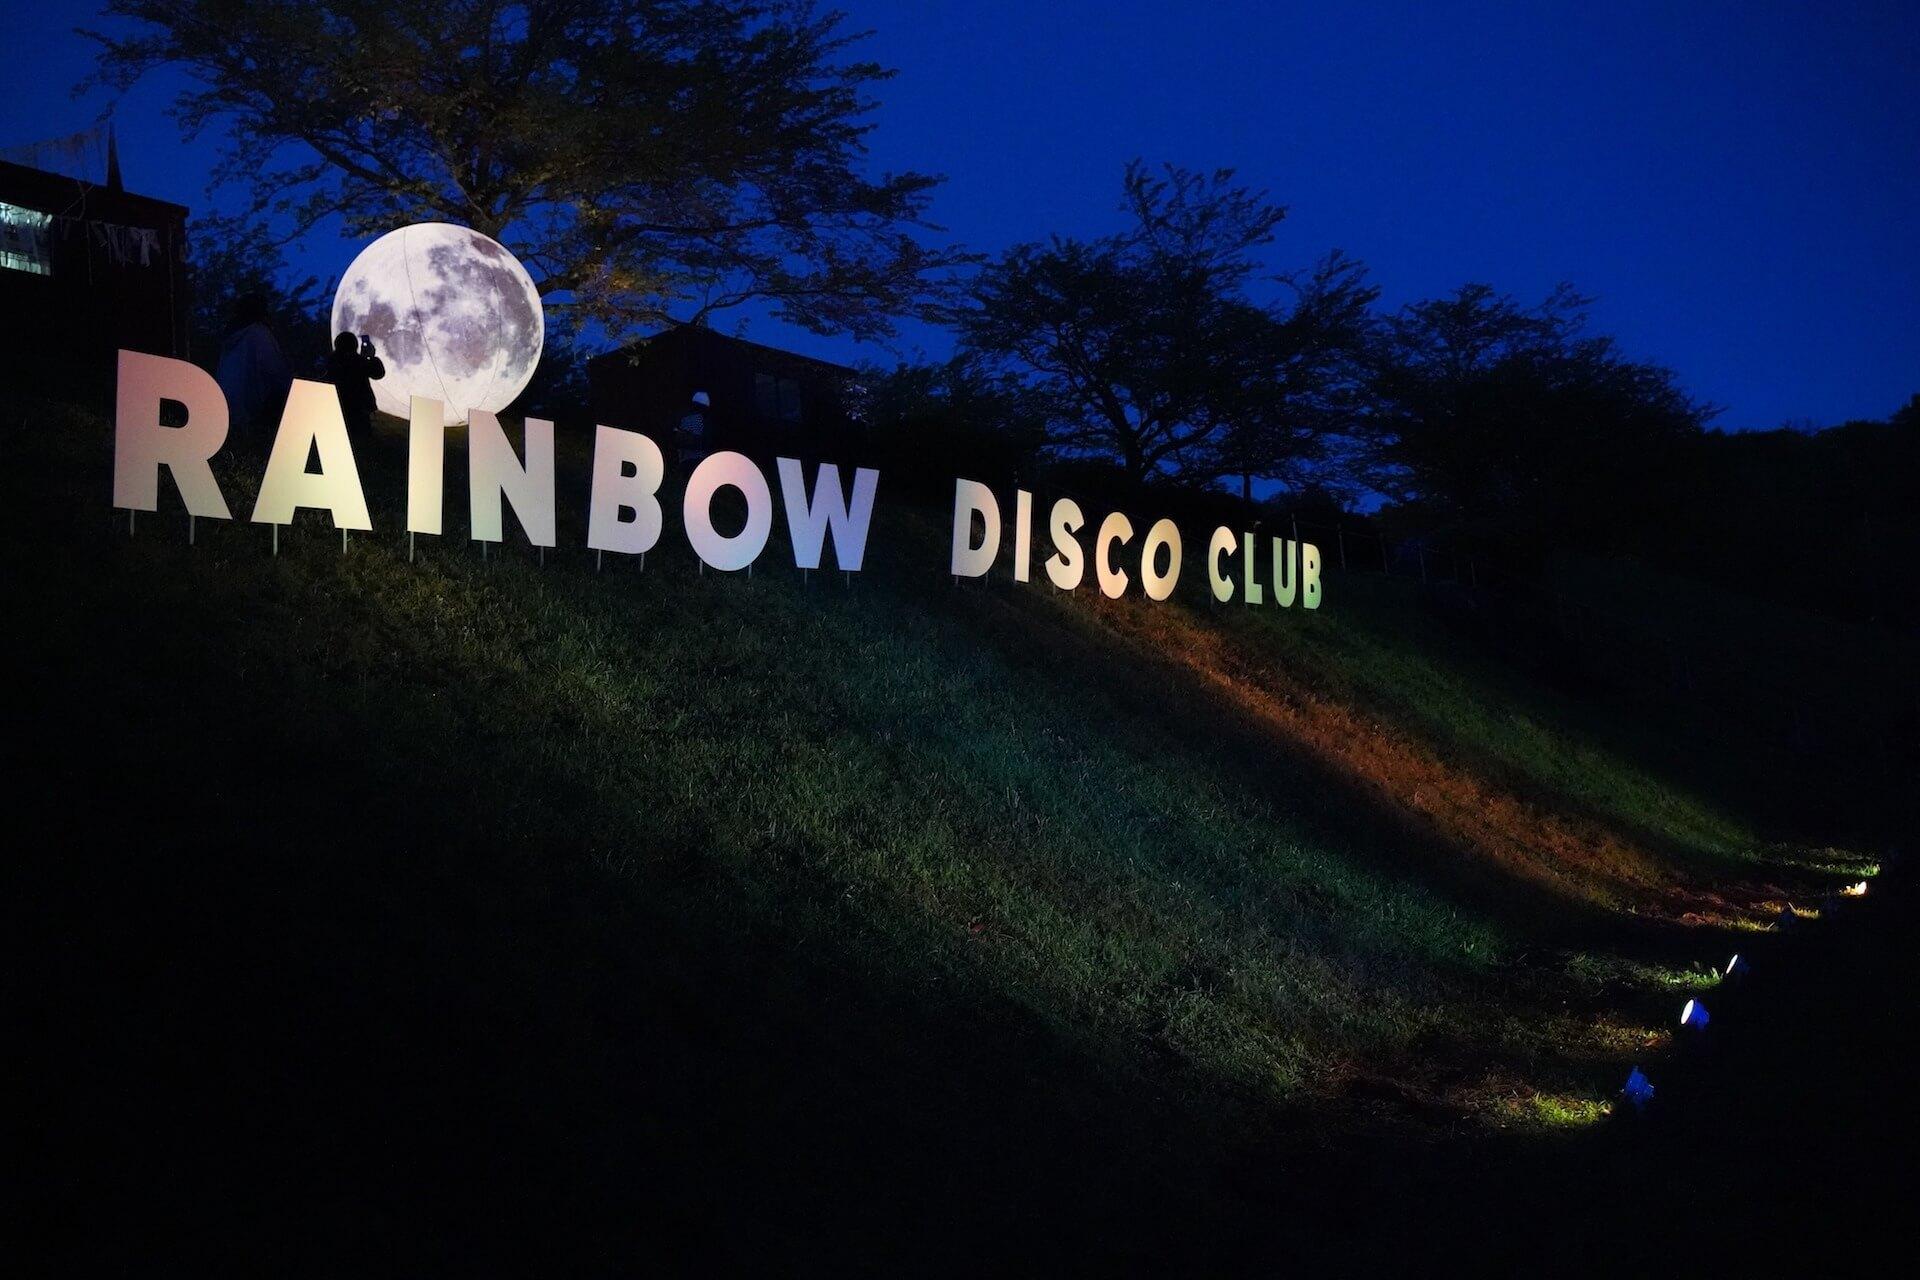 RAINBOW DISCO CLUB 2019